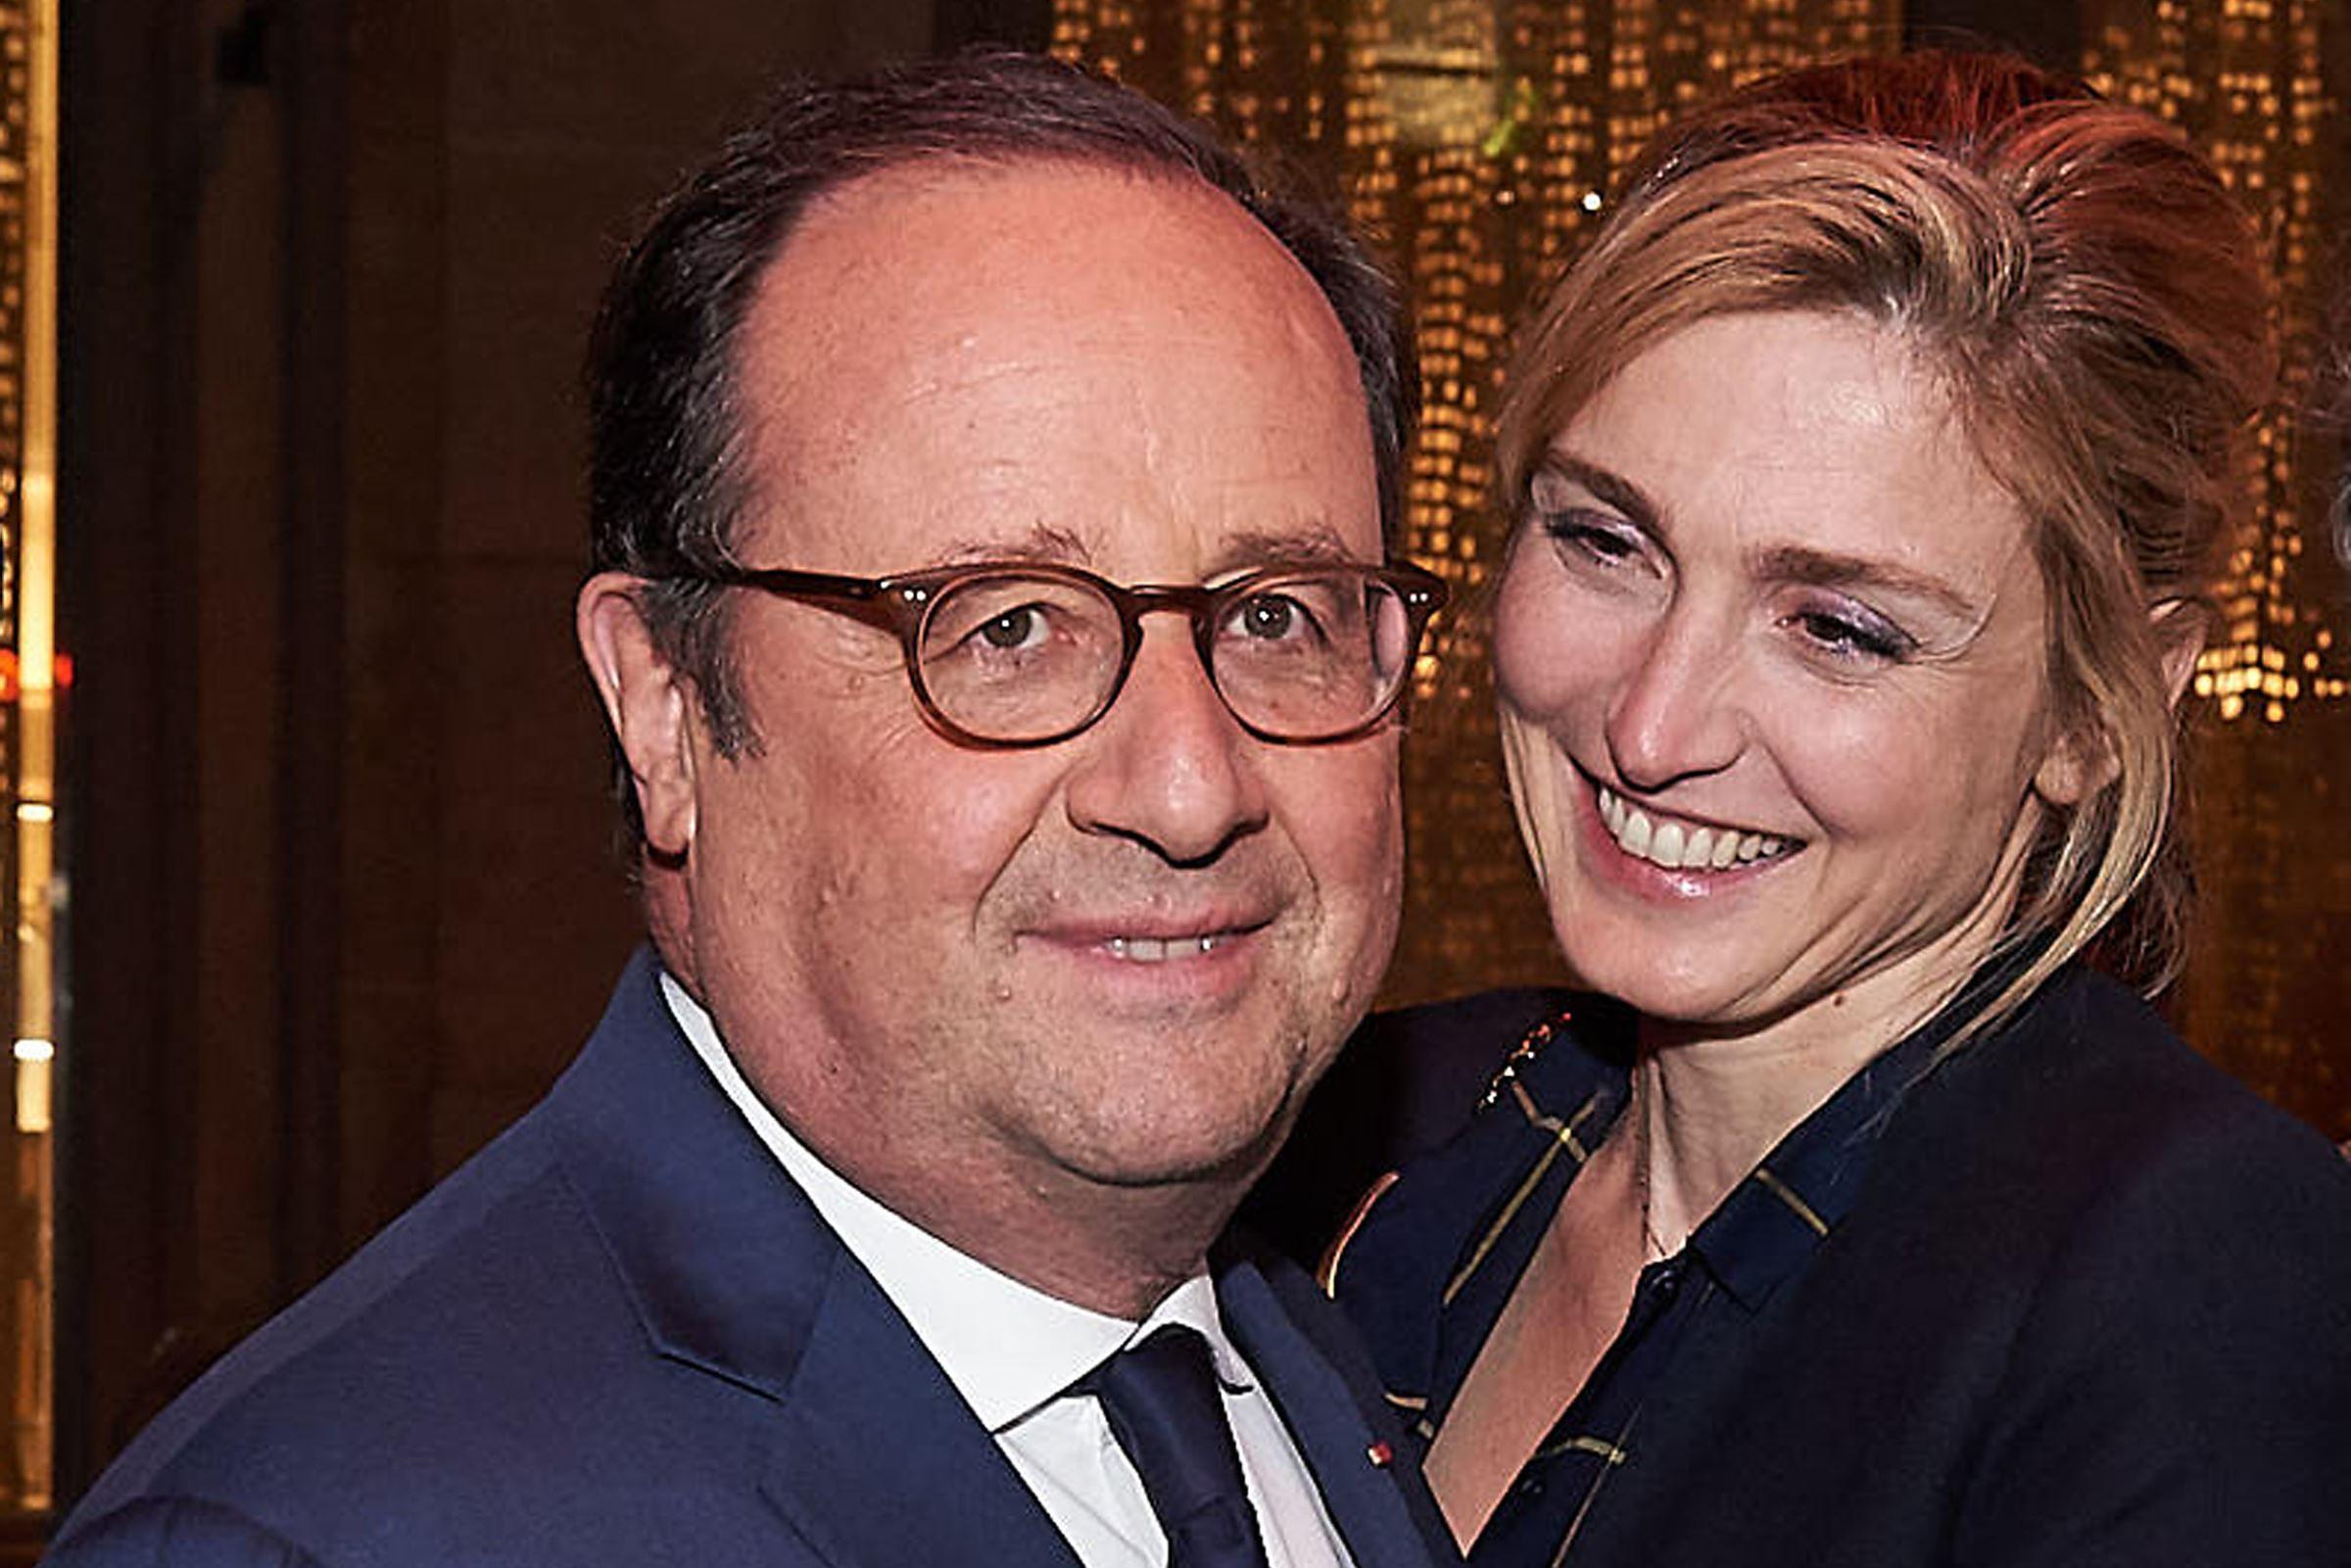 Invite Du Mariage De Franz Olivier Giesbert Francois Hollande A Reussi A Regarder Le Match Des Bleus Julie Gayet Francois Hollande Julie Depardieu